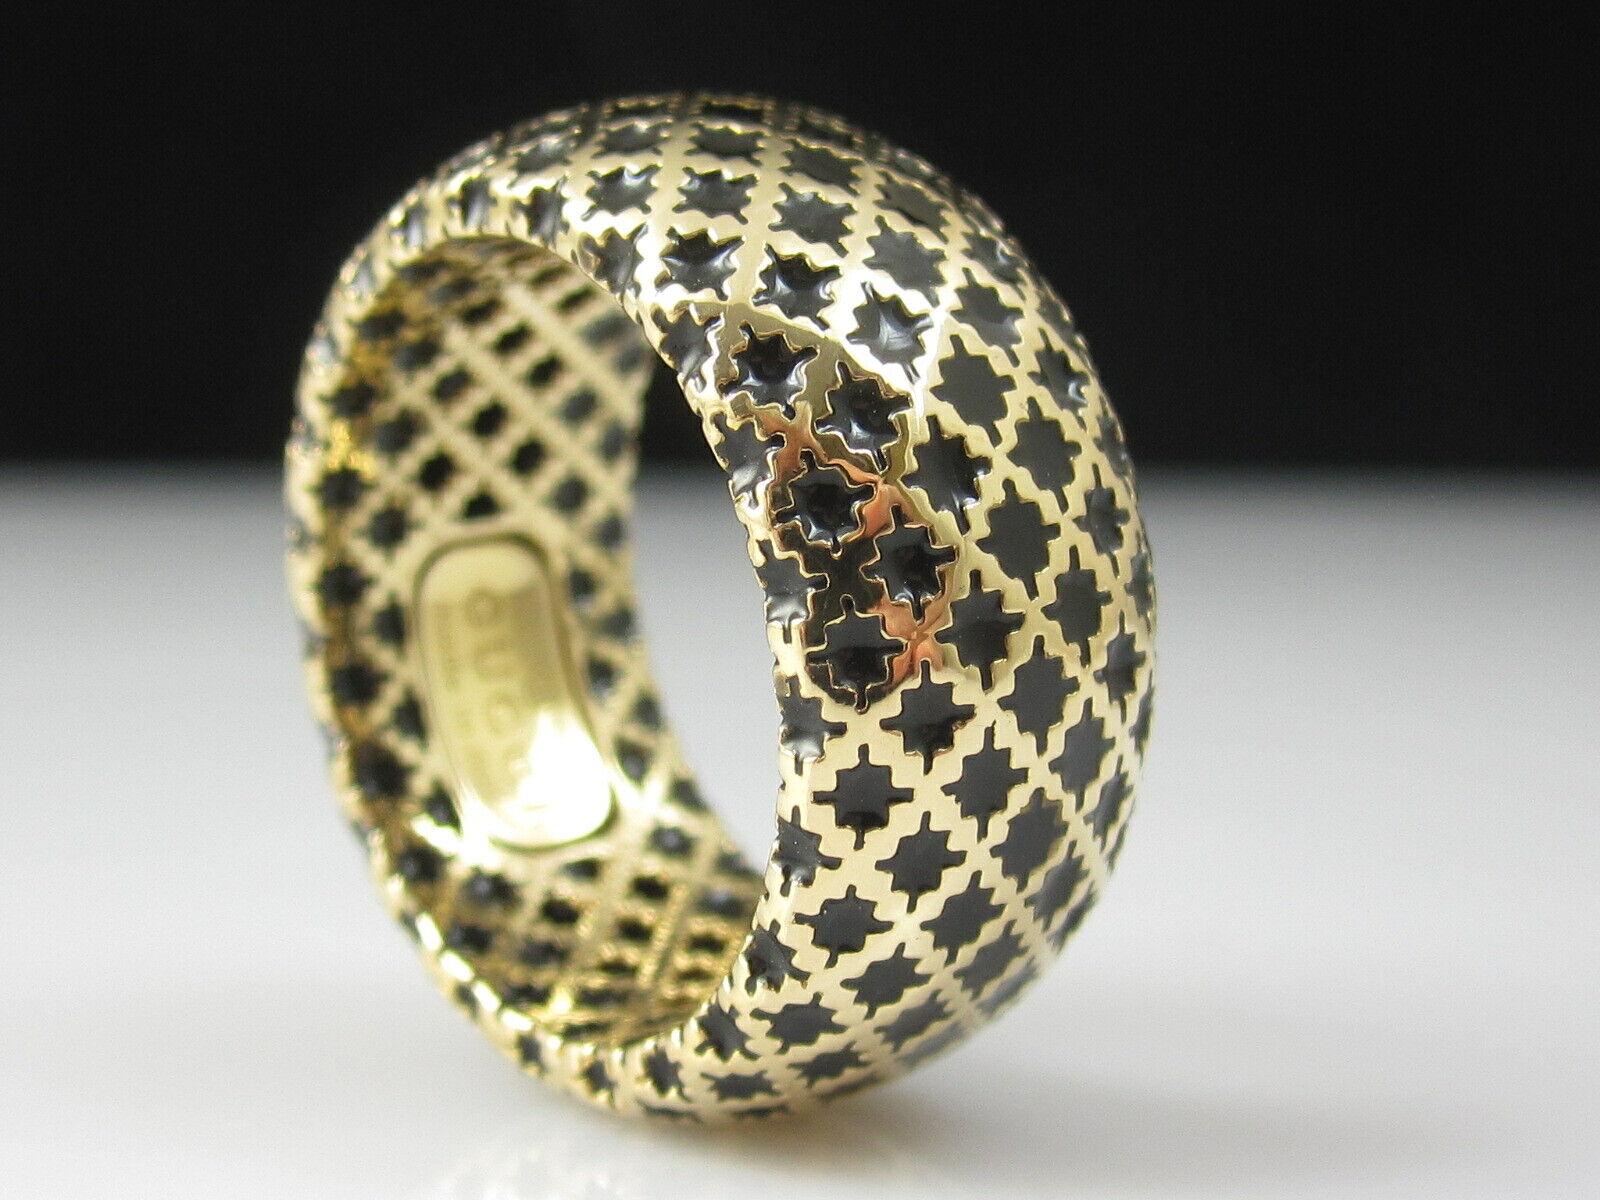 GUCCI Ring 18K ITALY Yellow Gold Black Enamel Wide Band Diamantissima Size 7 - $750.00